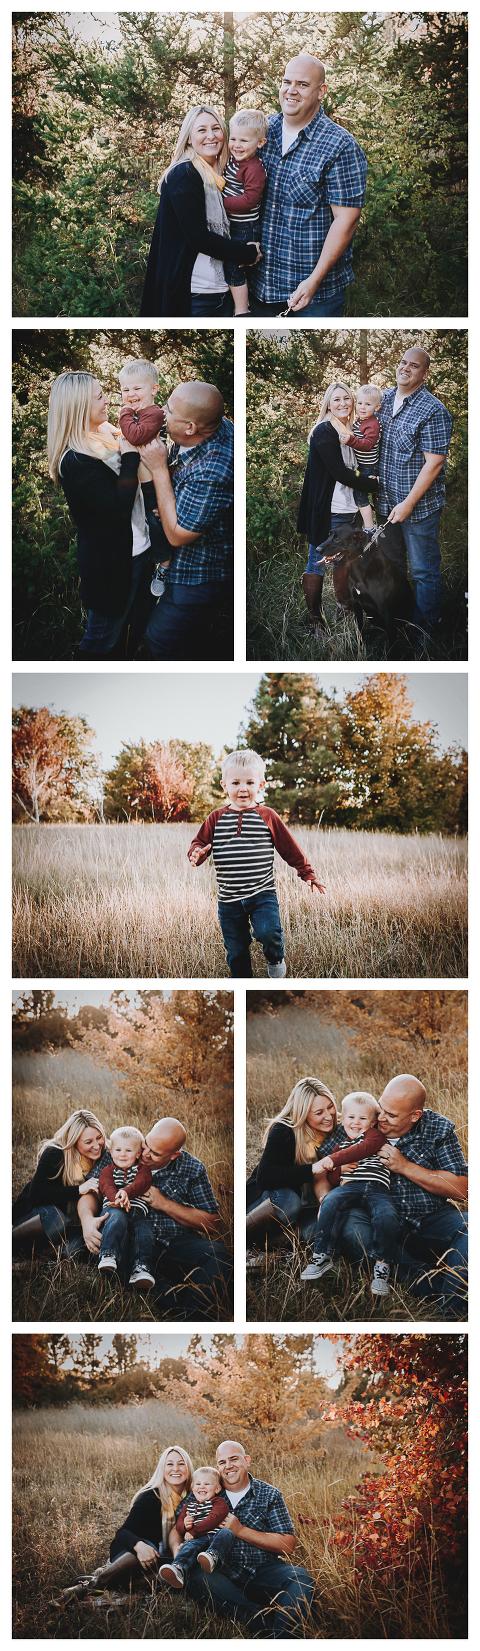 Lane and Family, Haberman Family, Lifestyle session captured by Hailey Haberman, Ellensburg, WA